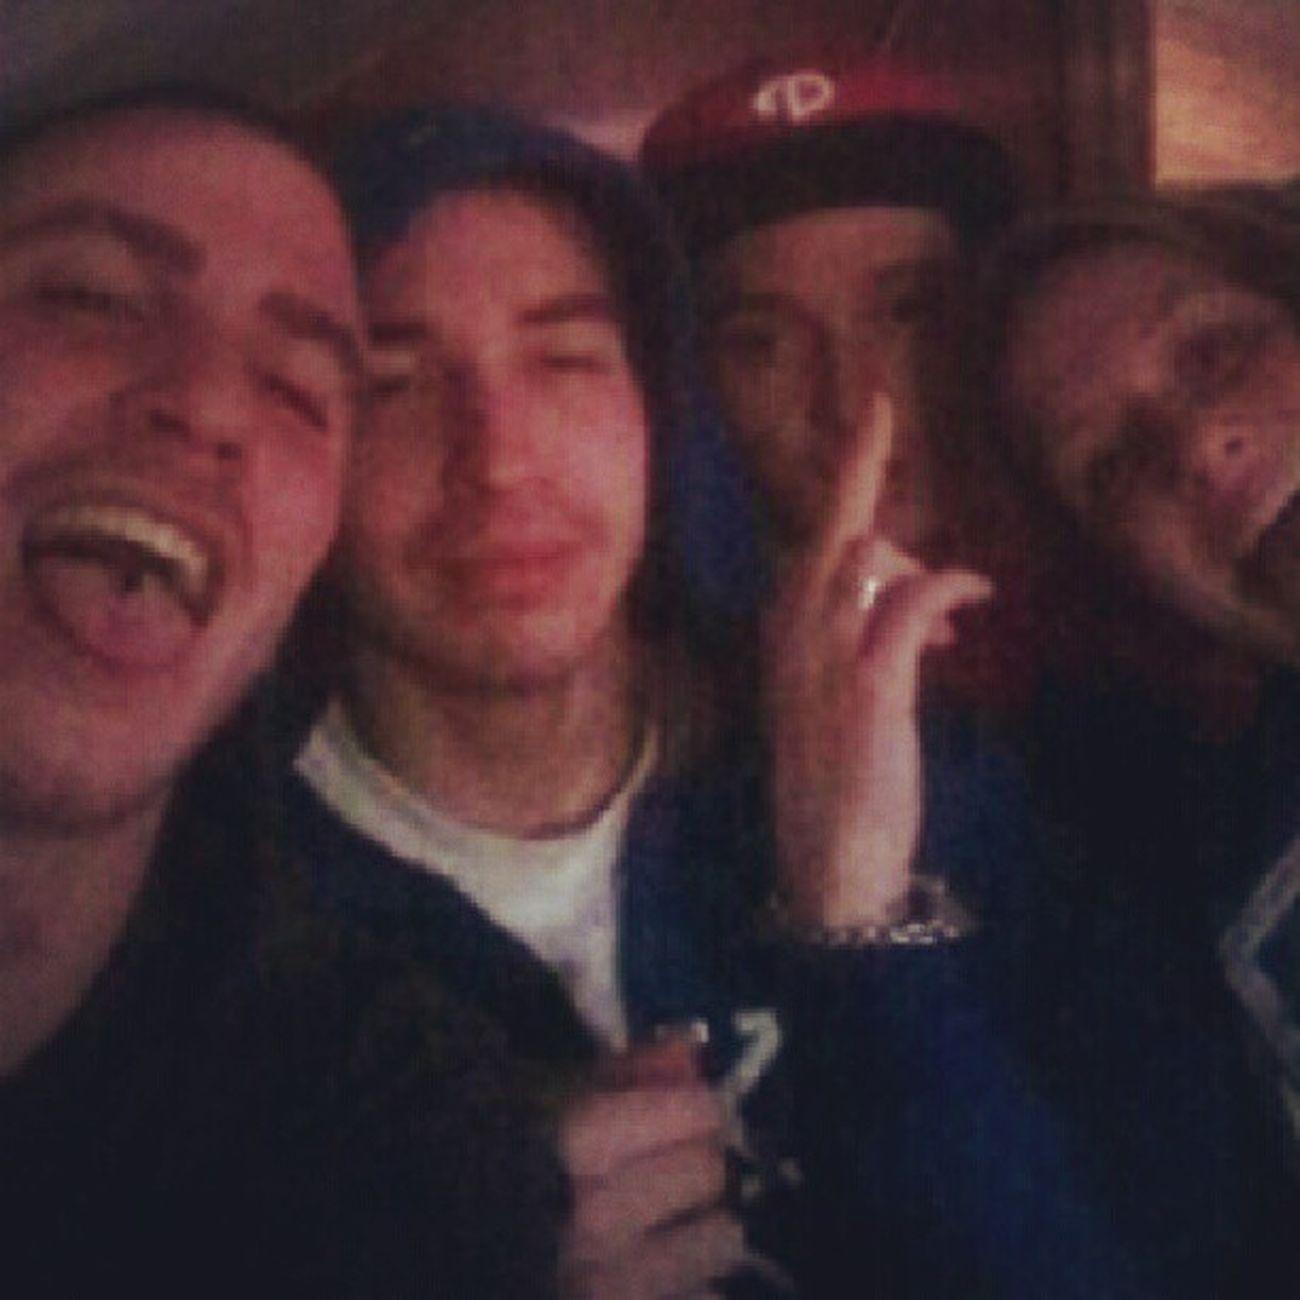 Old crew reunites! Yupyup me dom curly and Phil wadduuuuupp @datniggawitdatr32 Yeabuddy Wheresniggad